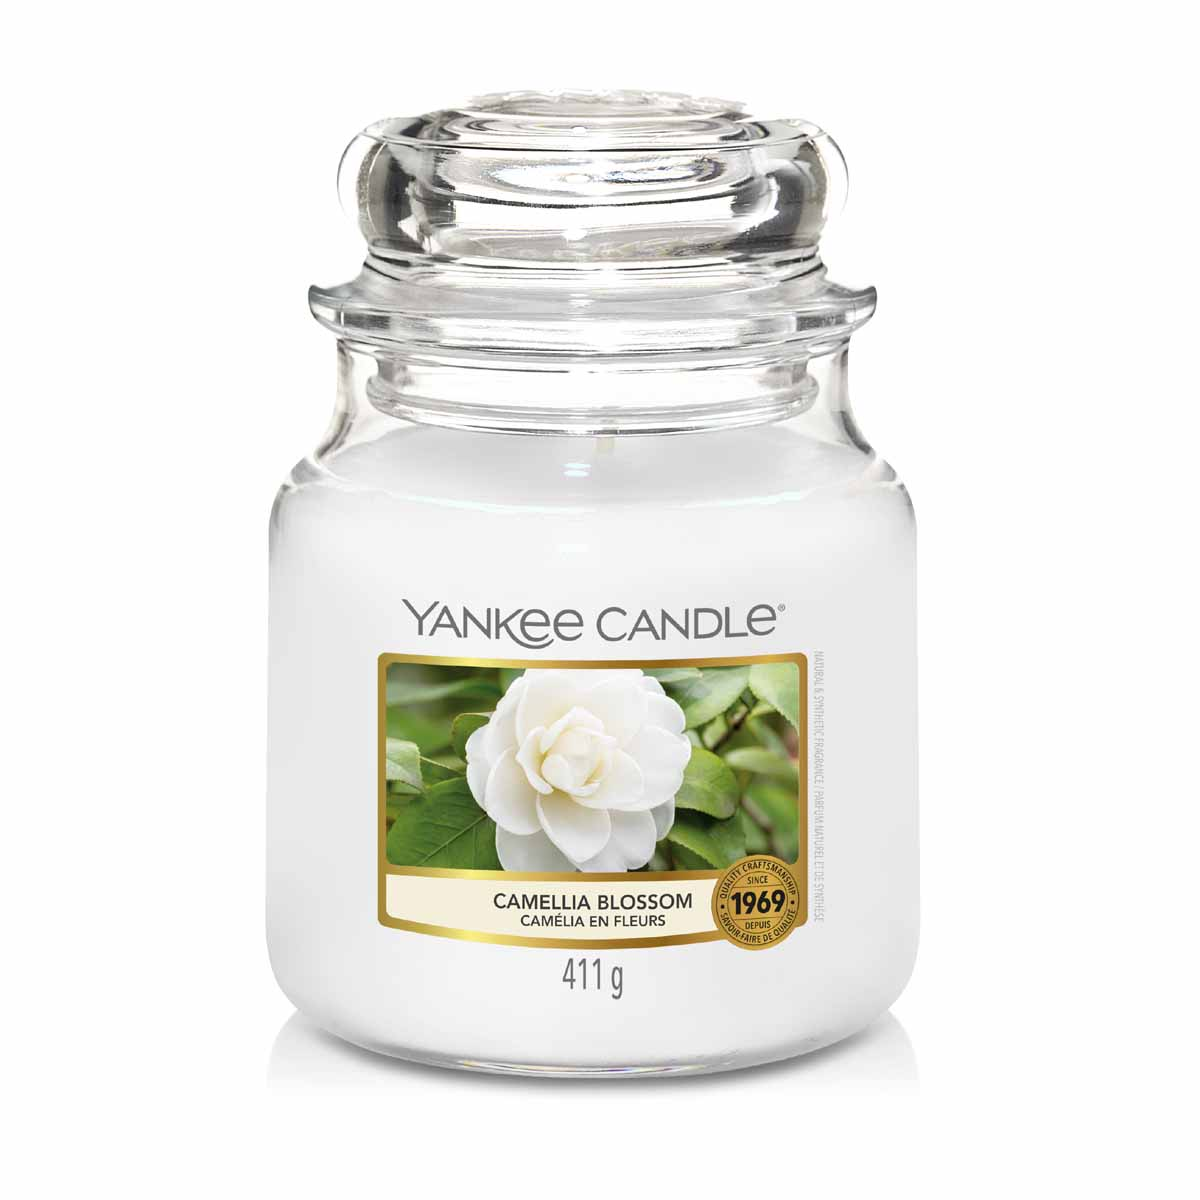 Yankee Candle Camellia Blossom Giara Media